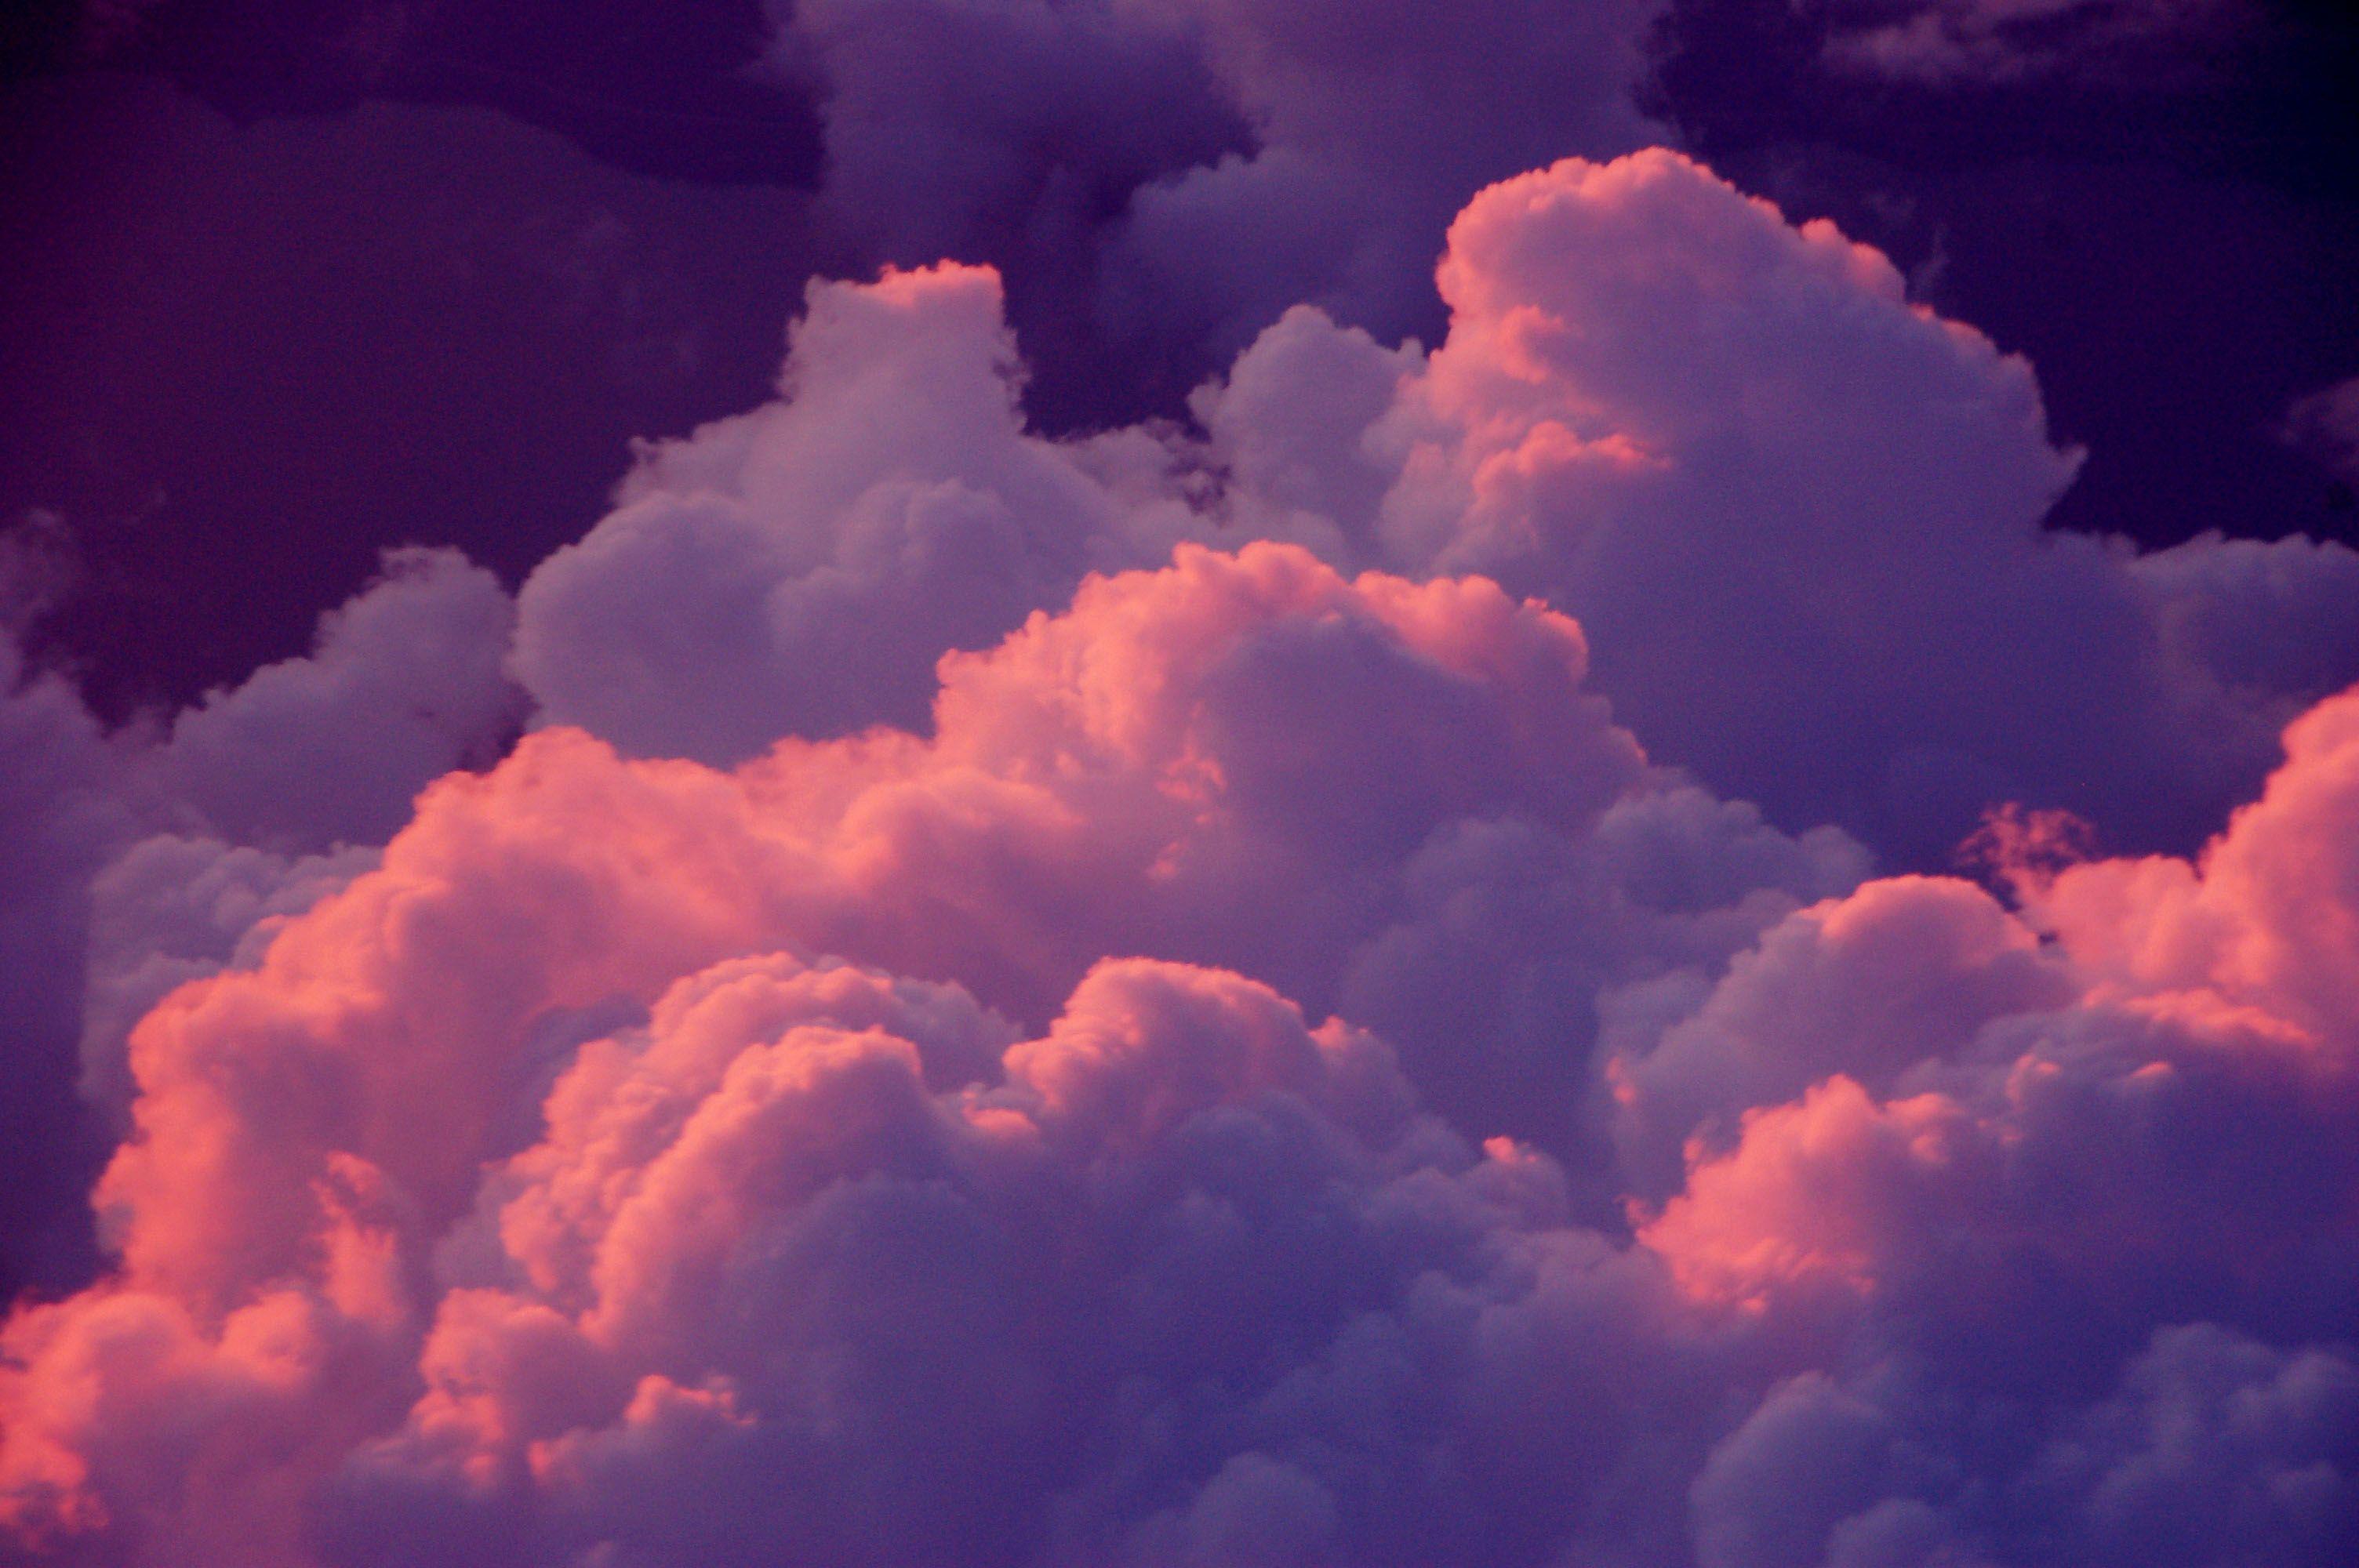 Pink Cloud Aesthetic Desktop Wallpapers Wallpaper Cave